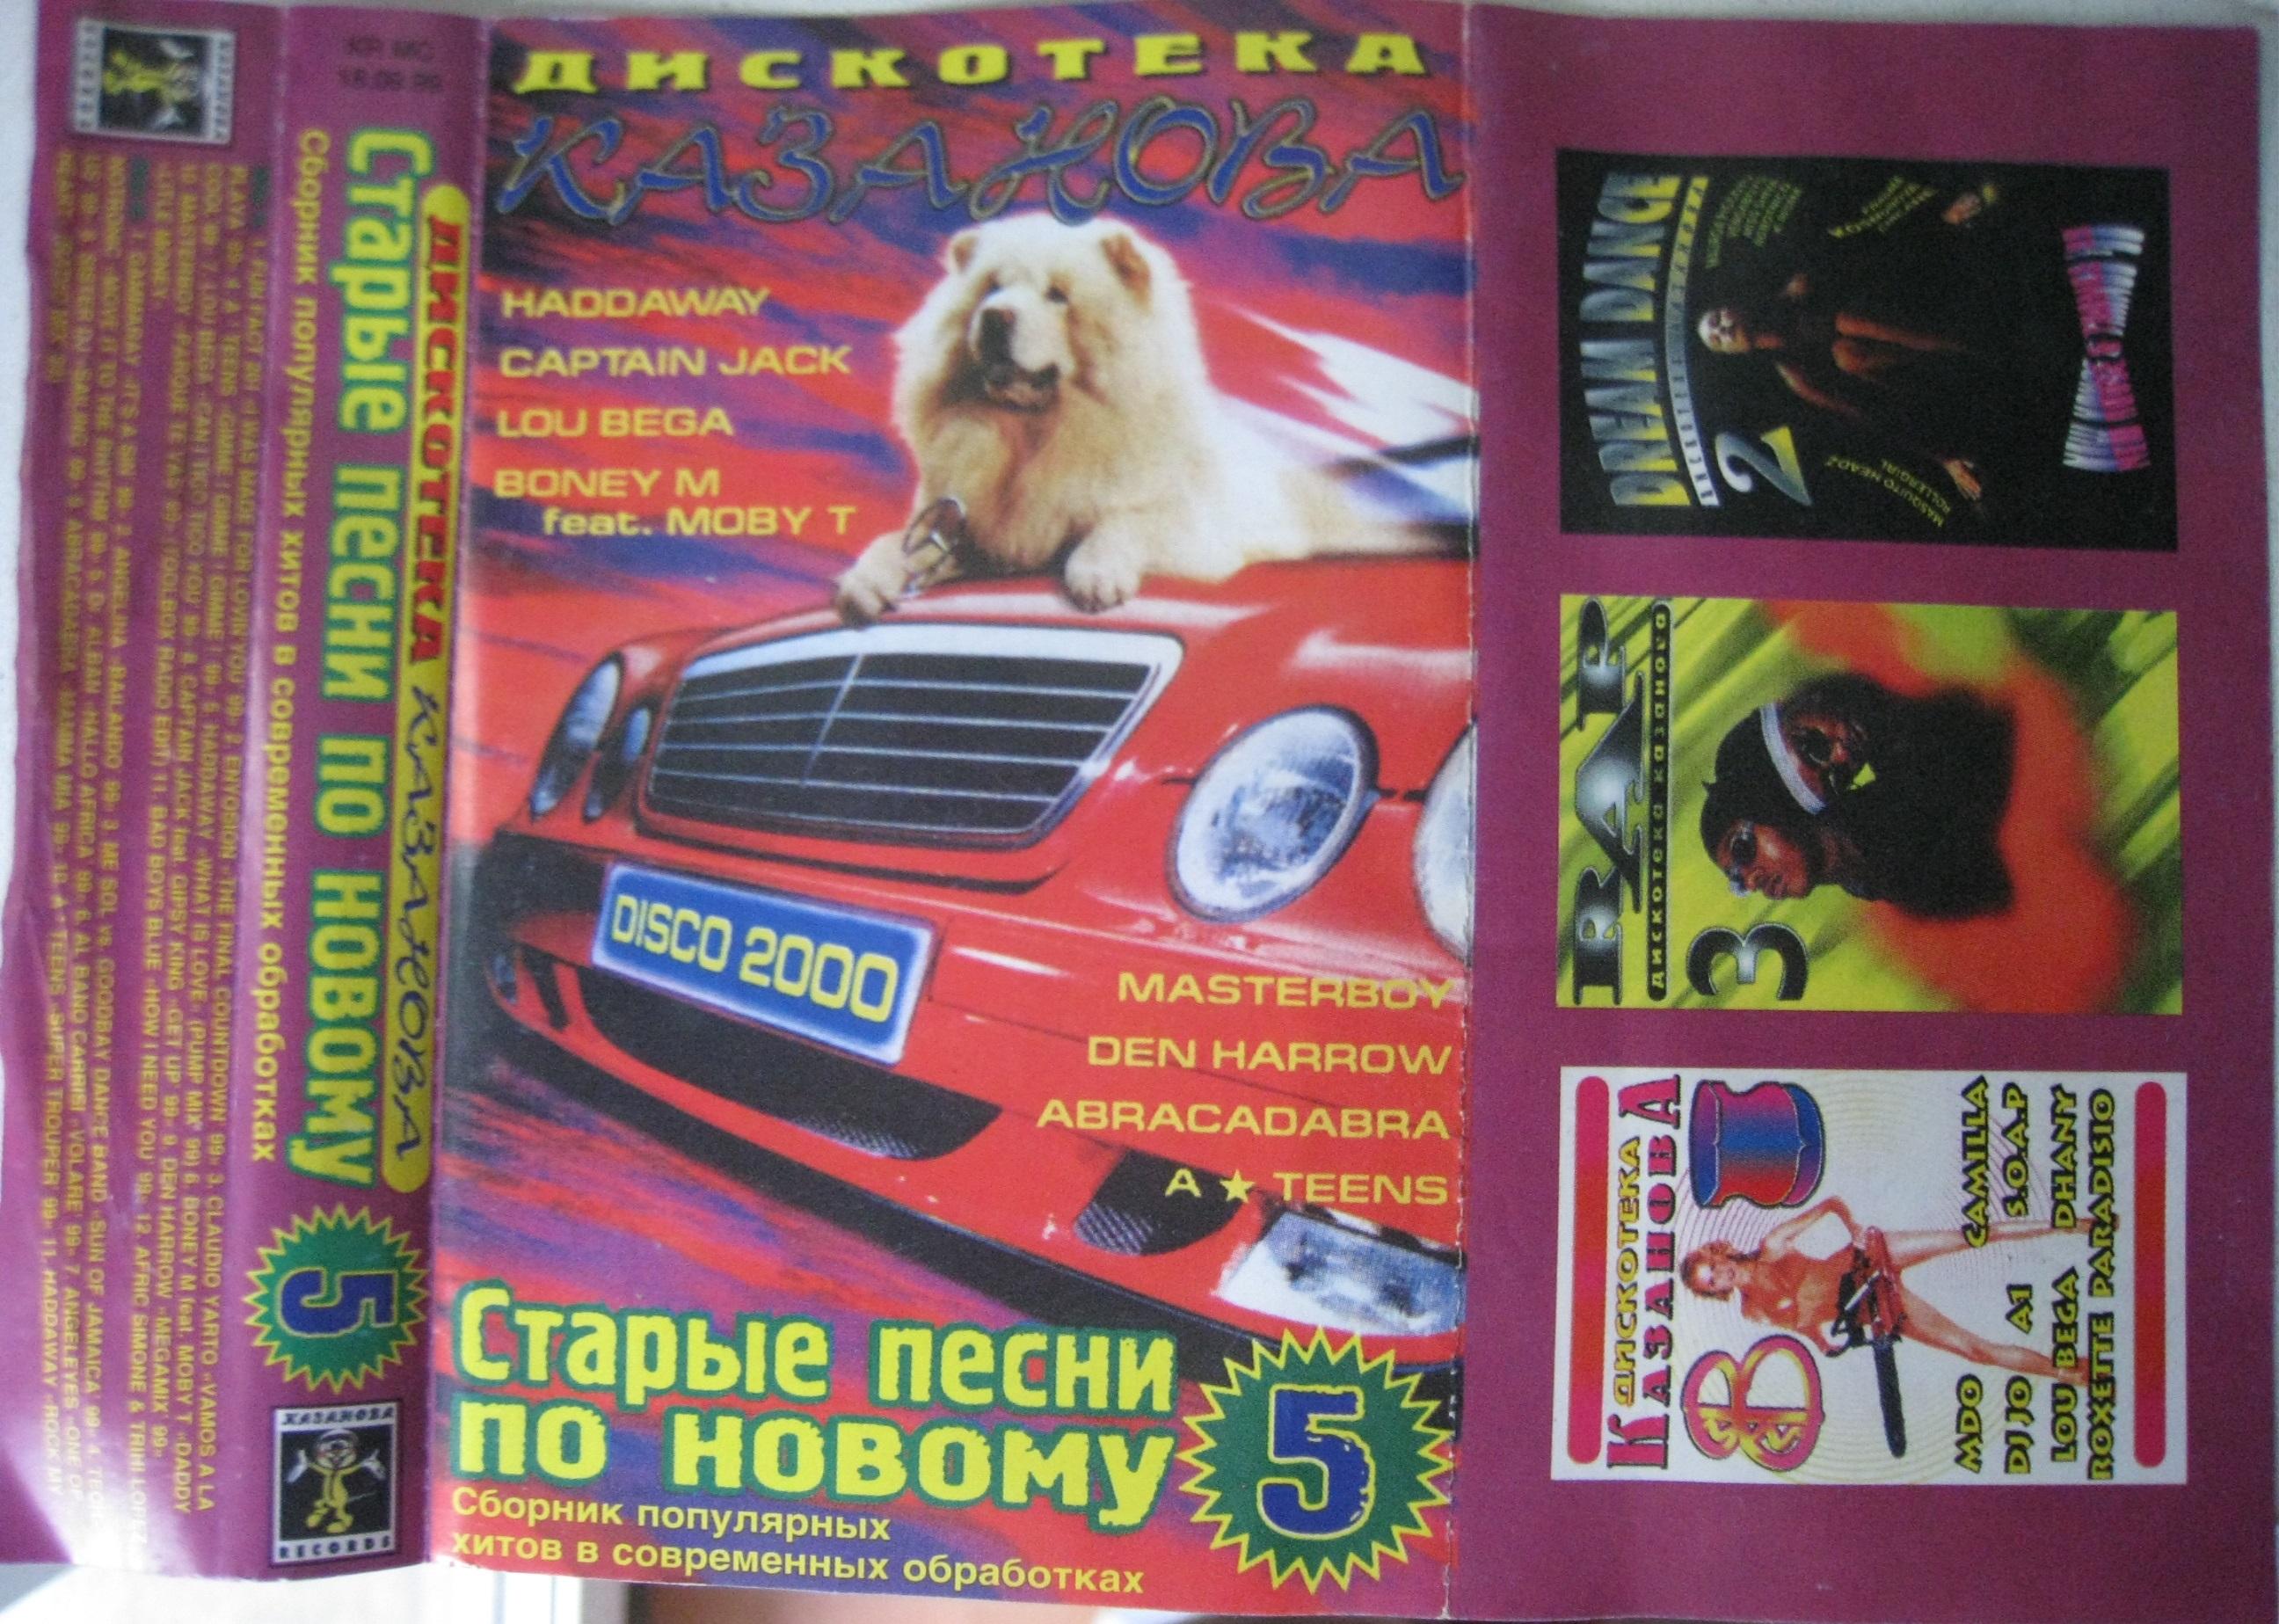 http://s4.uploads.ru/cqtIg.jpg